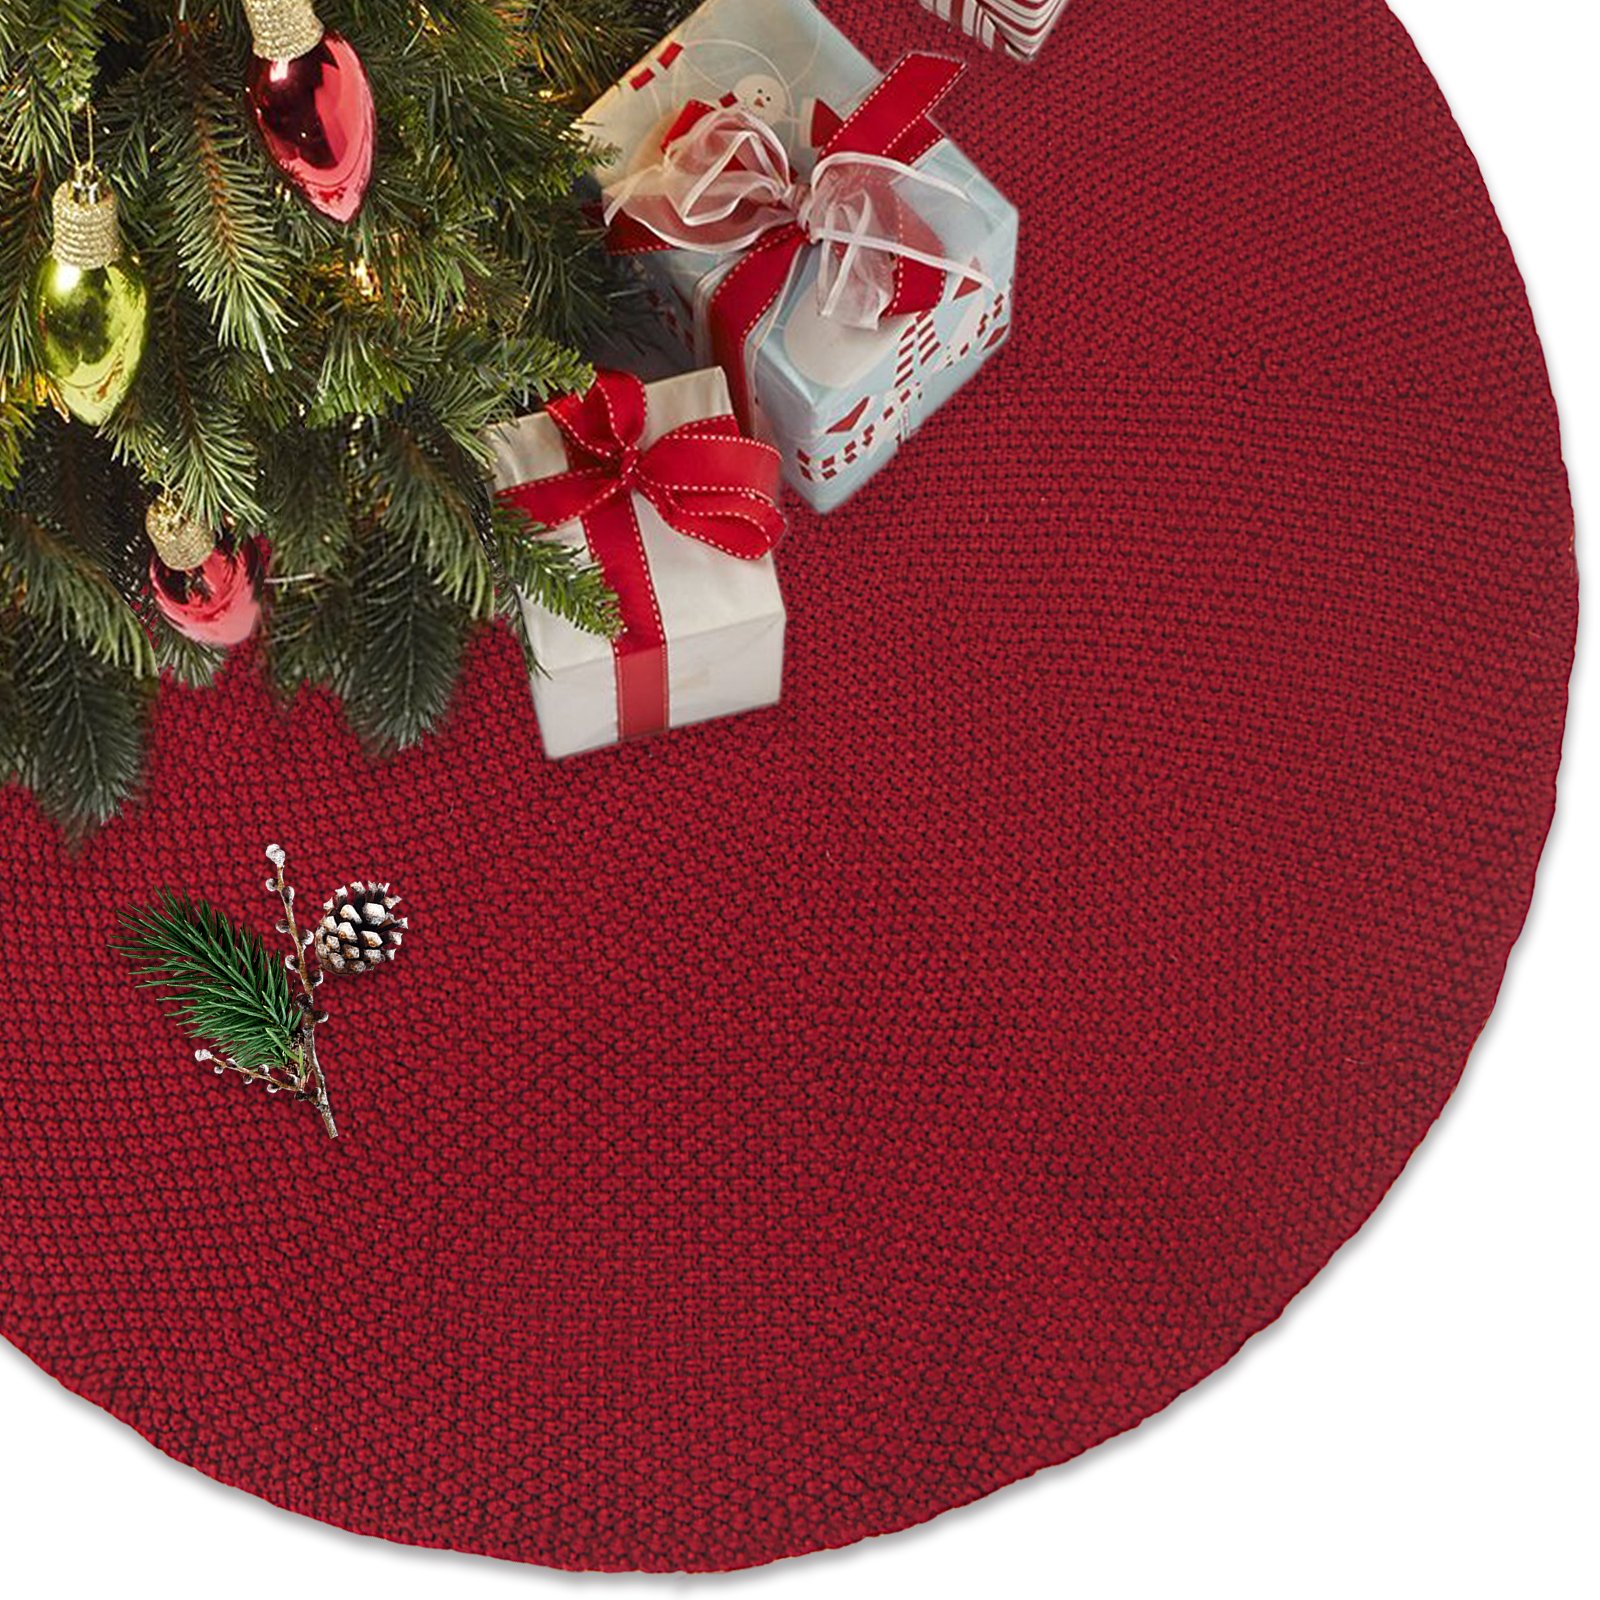 LimBridge 48'' Luxury Knitted Christmas Tree Skirt Thick Heavy Yarn Wine Red Rustic Xmas Holiday Decoration